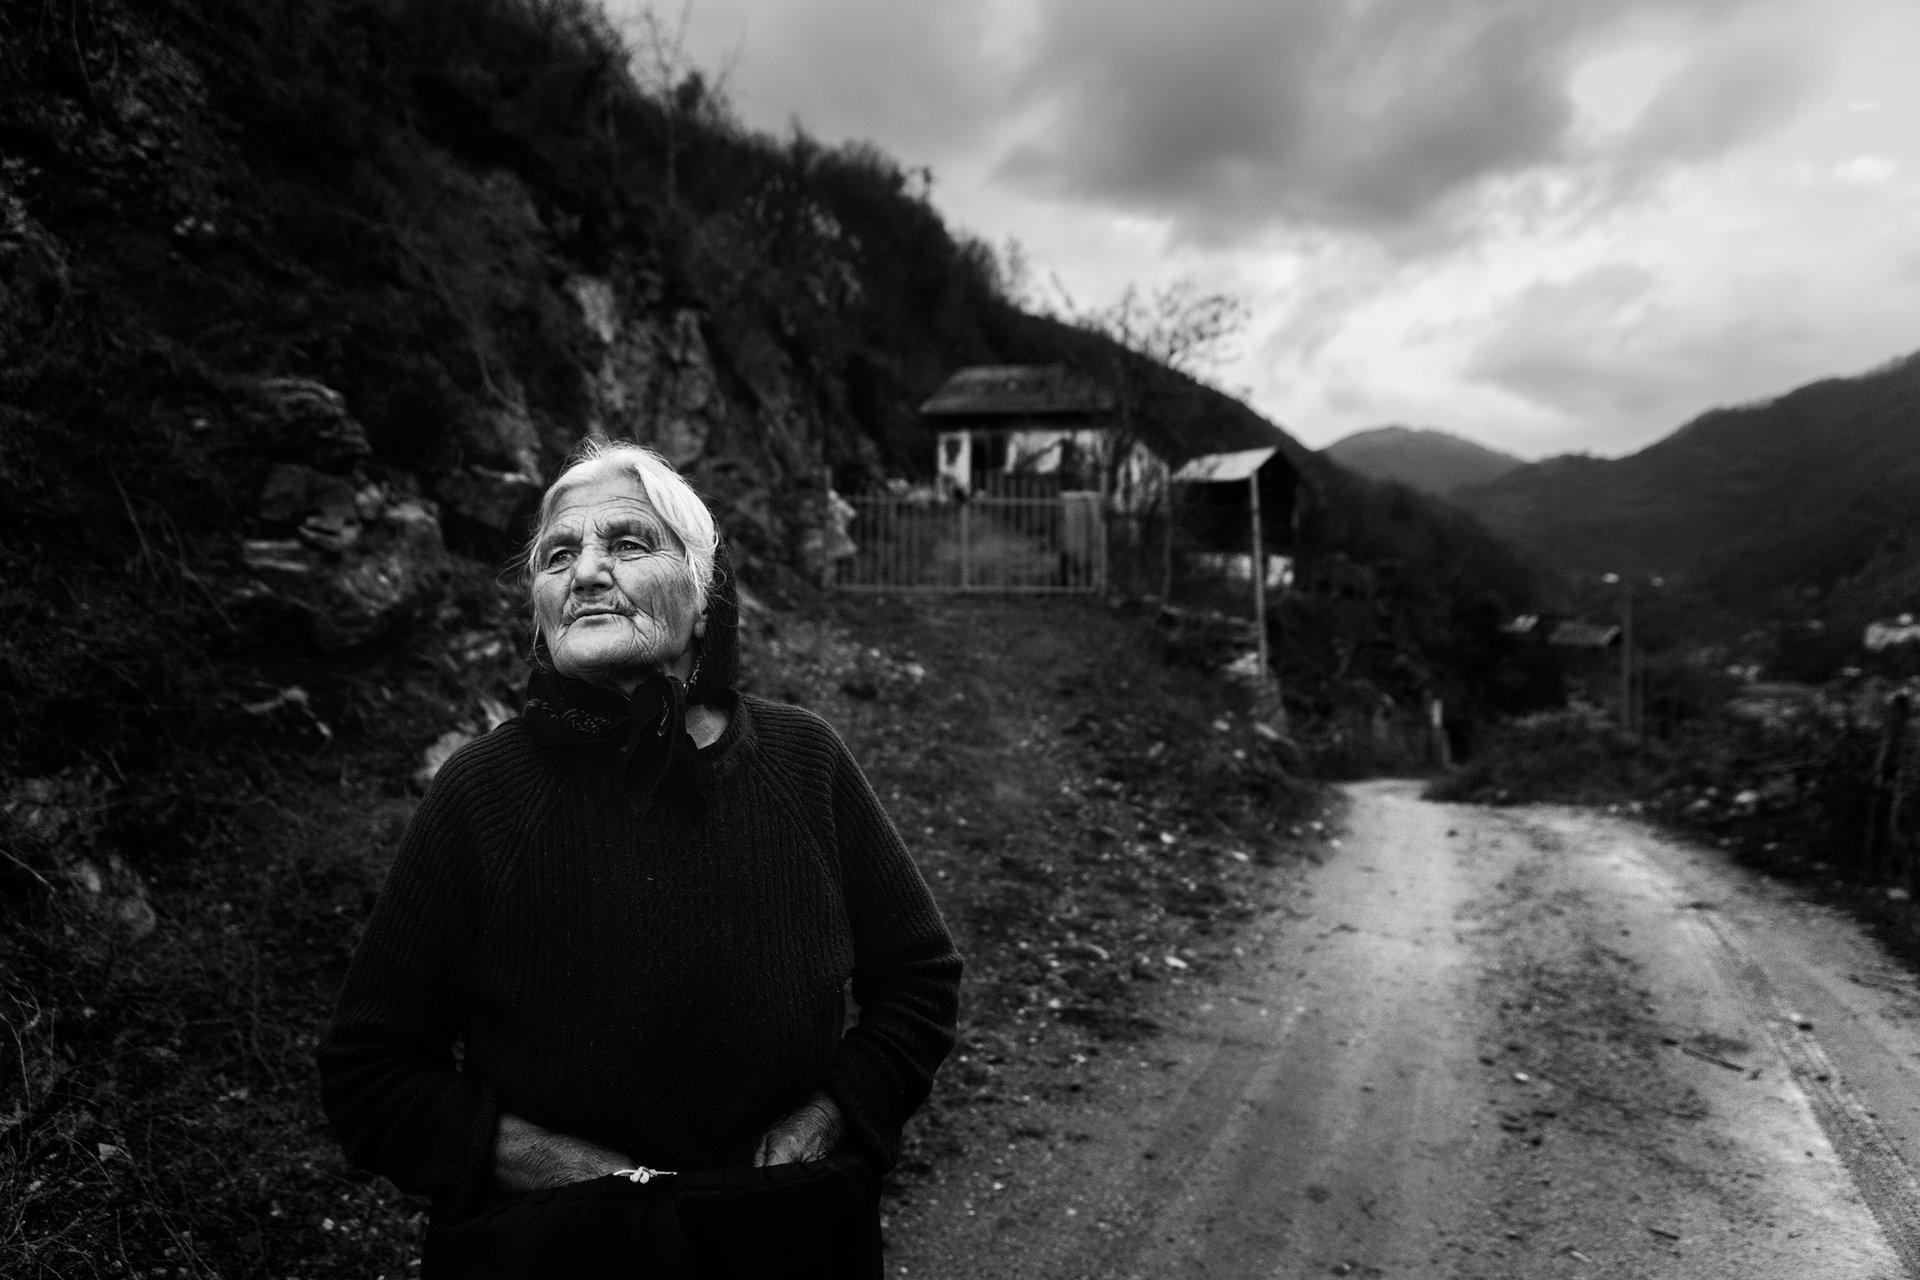 Последен кадър за 2020. Баба Стоянка с. Пирин | Author Marioshumanov | PHOTO FORUM